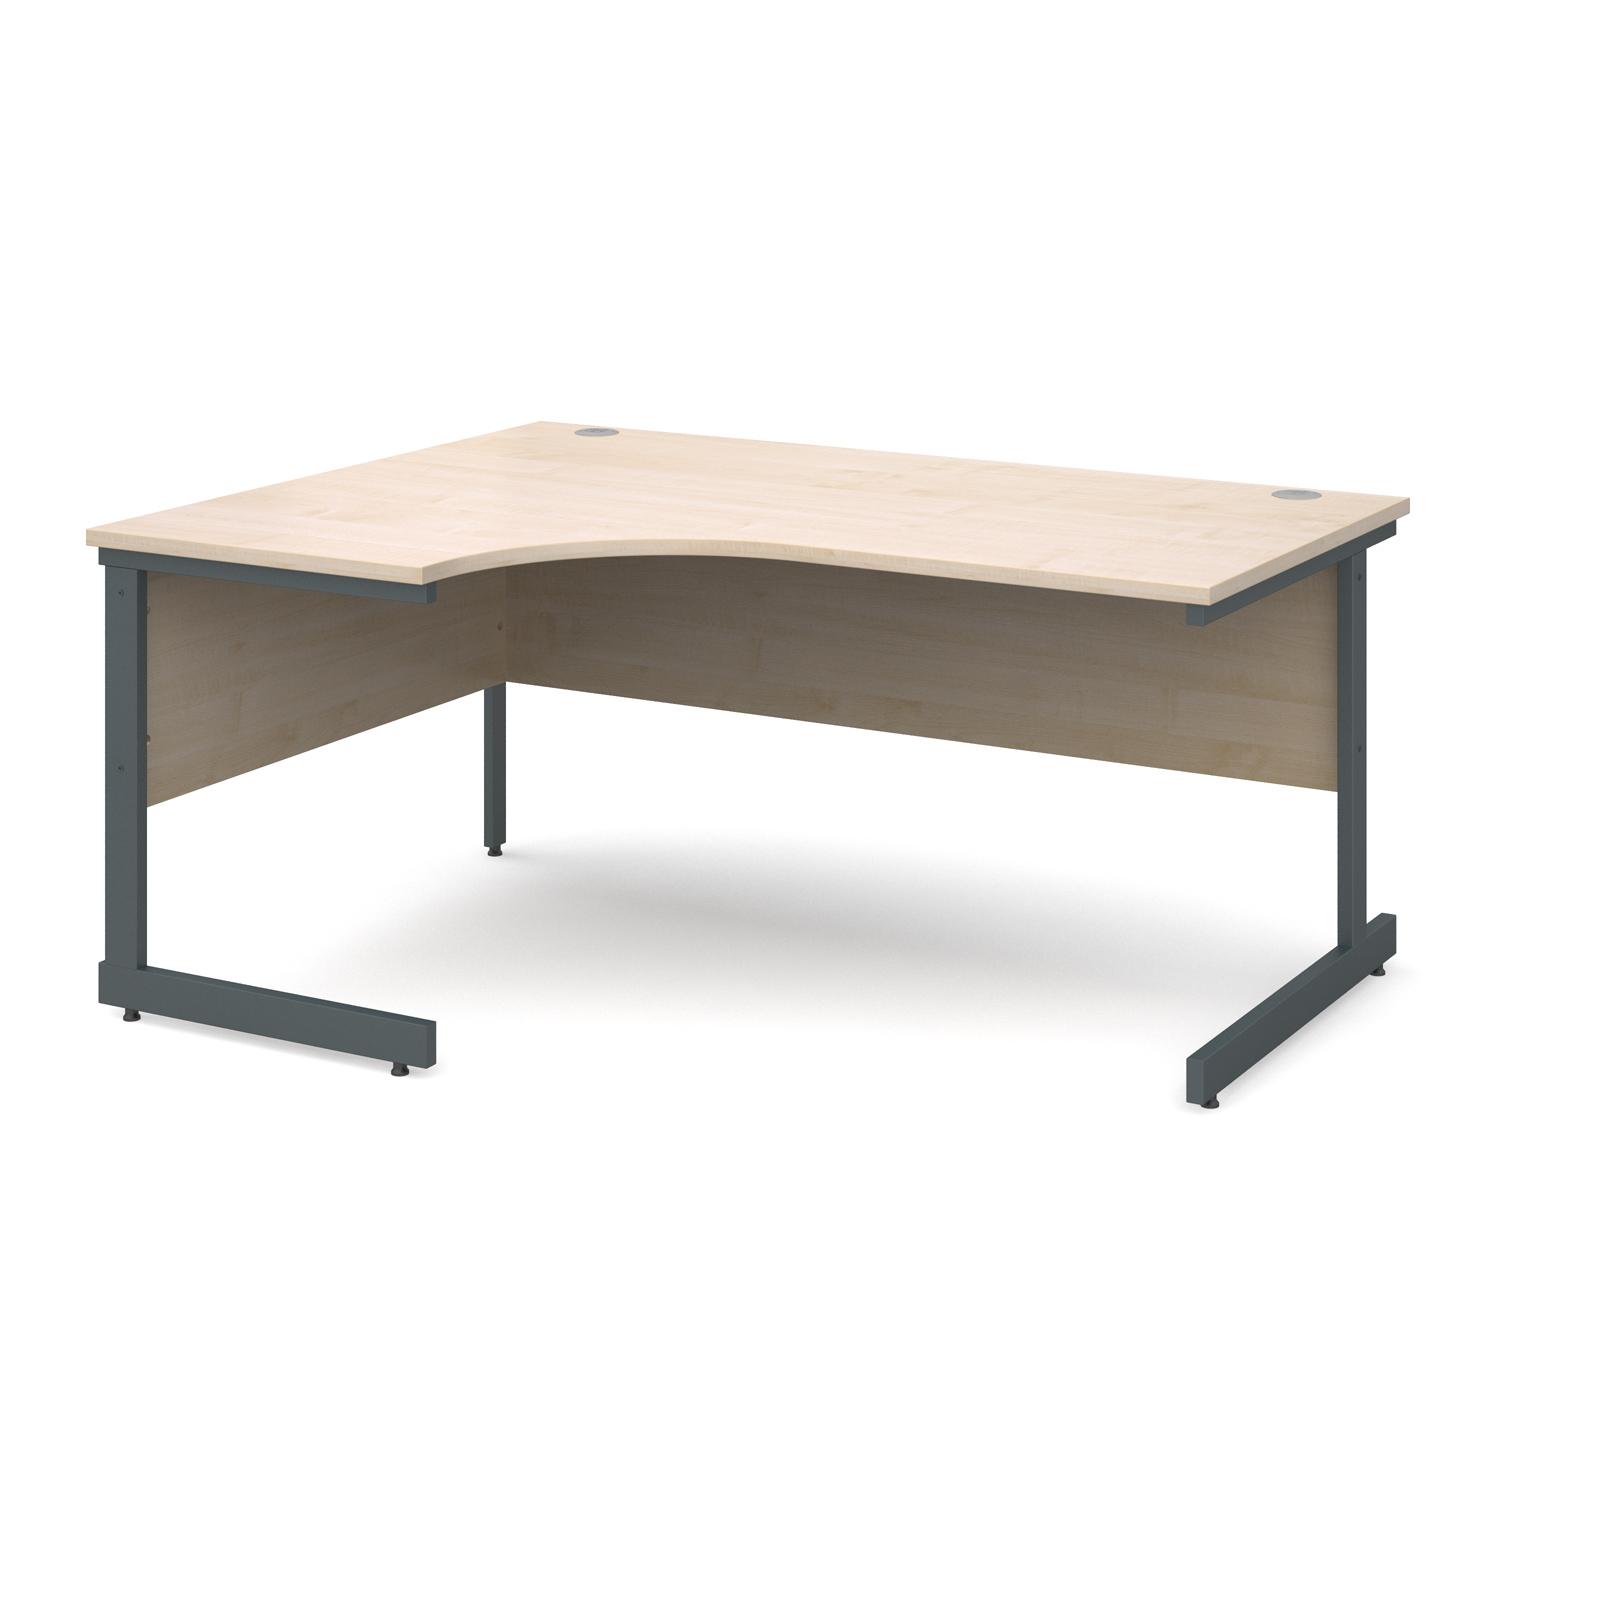 Contract 25 left hand ergonomic desk 1600mm - graphite cantilever frame, maple top